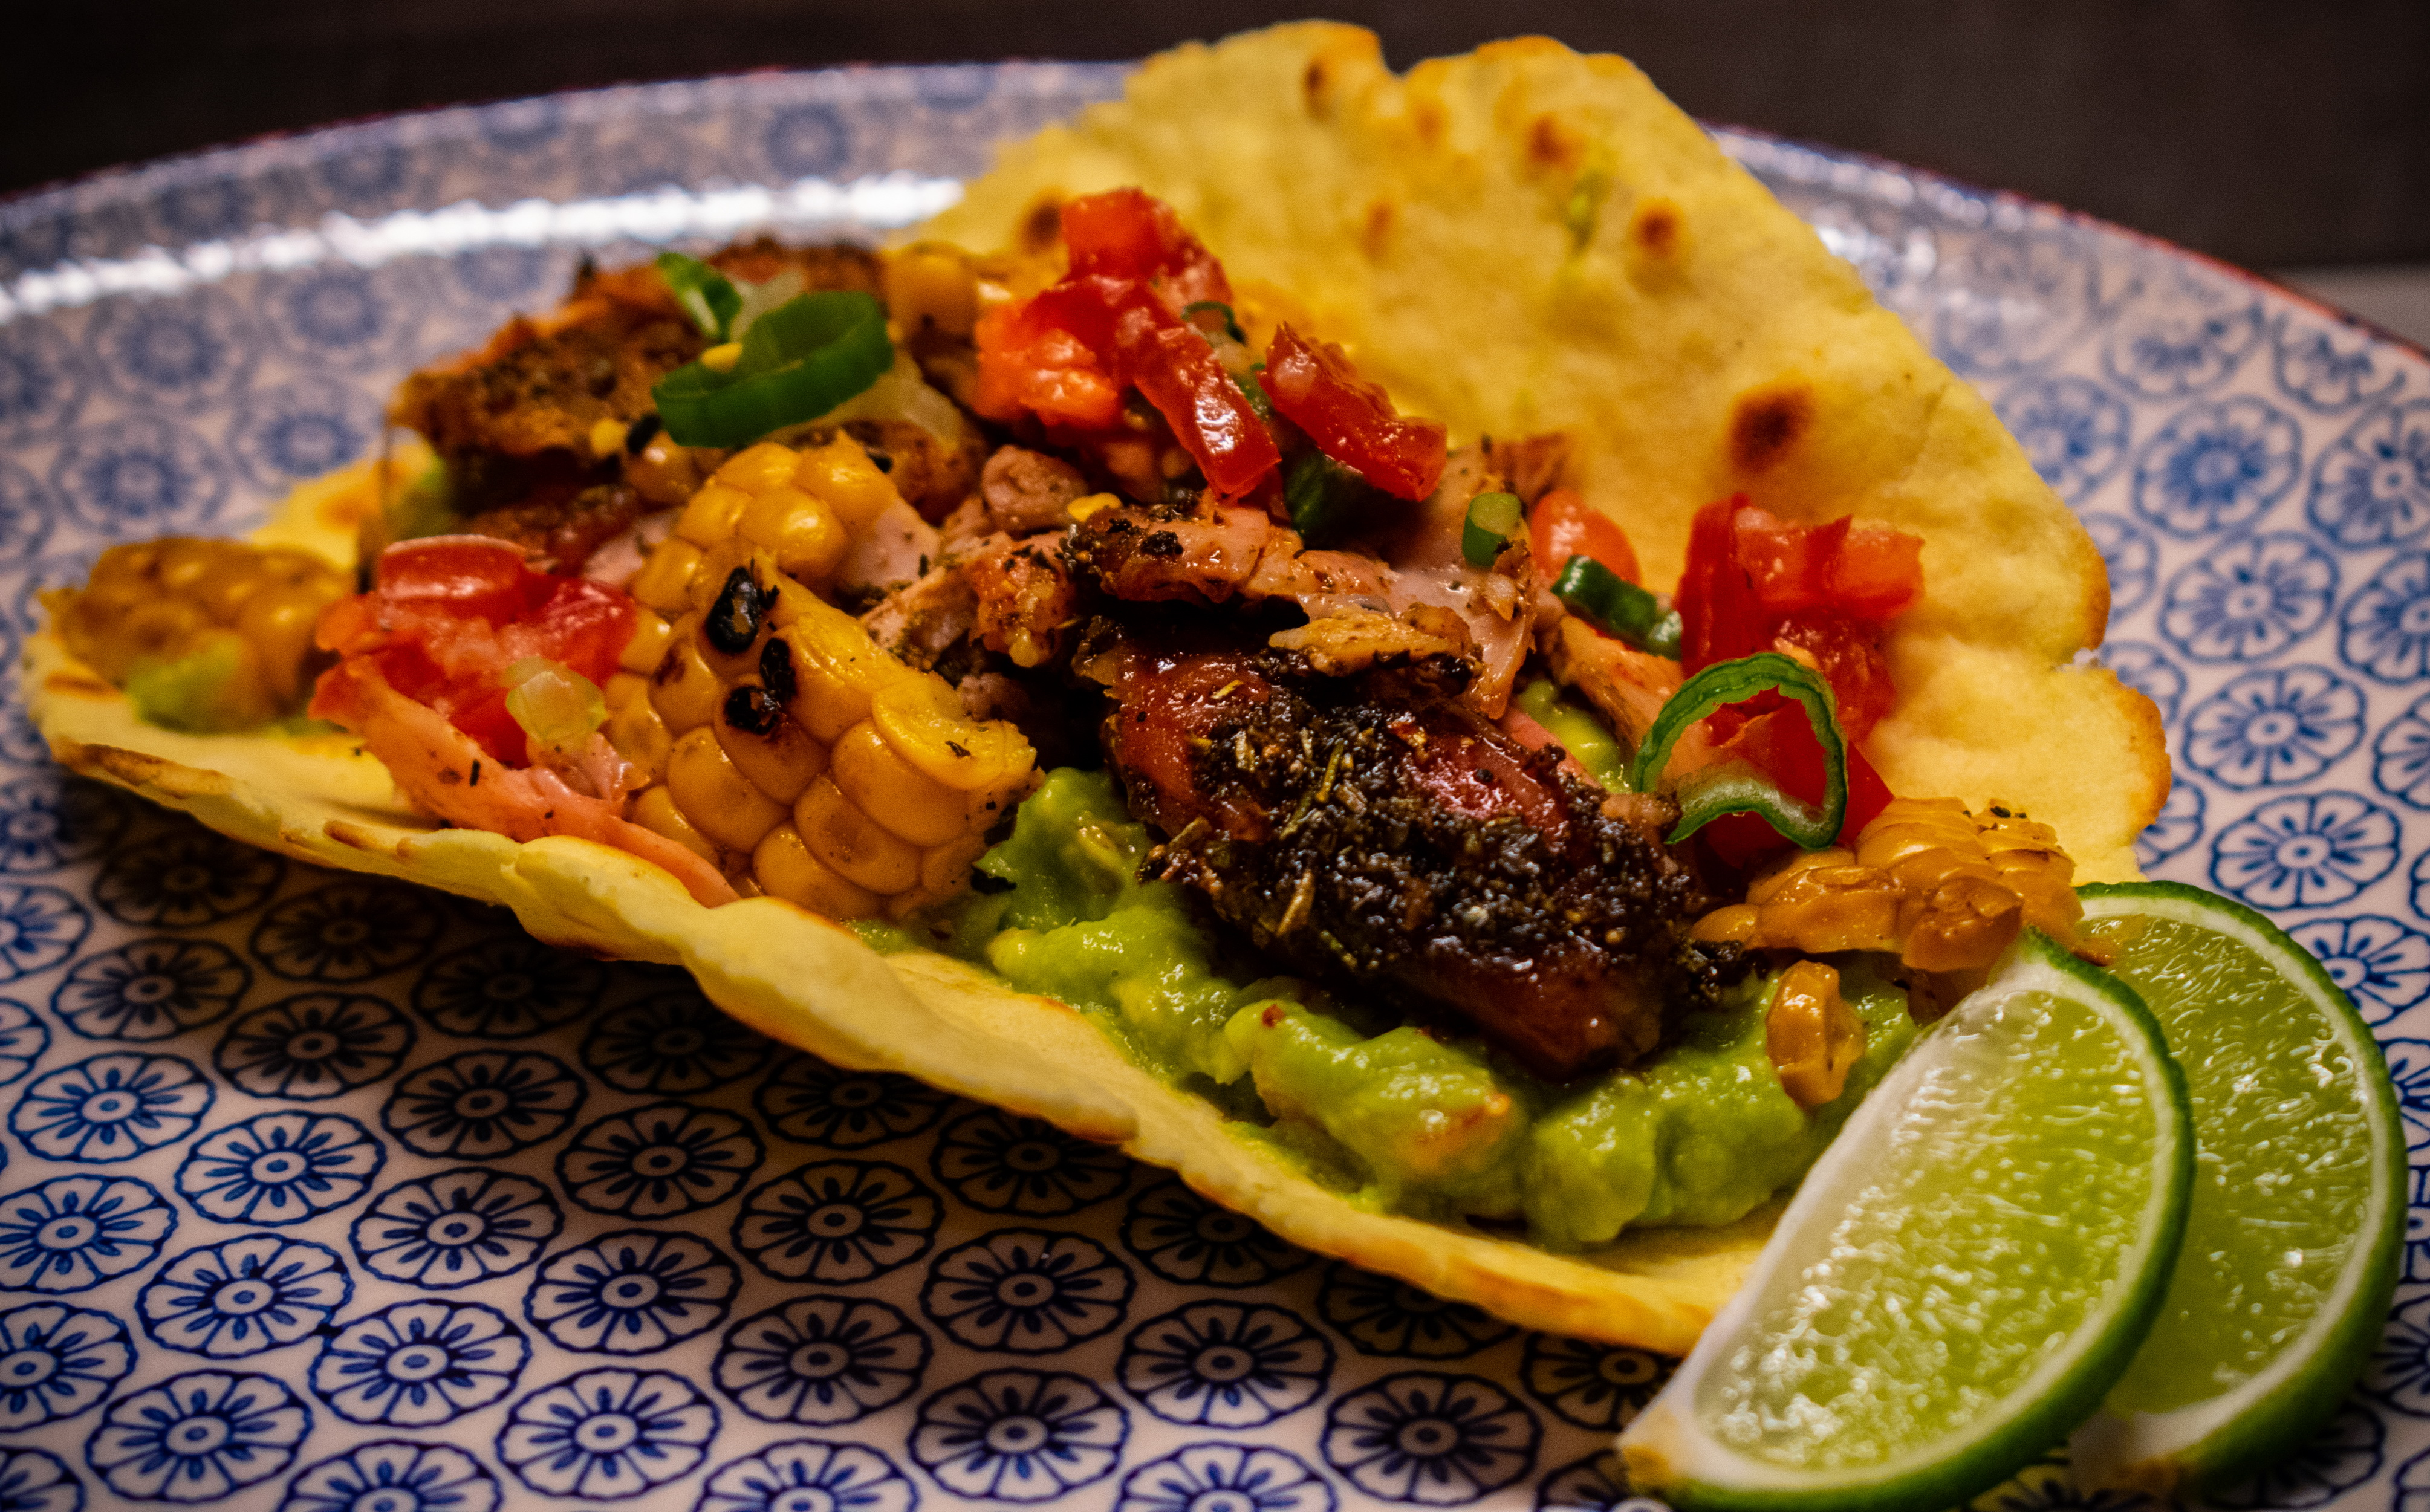 Brined Chicken Tacos